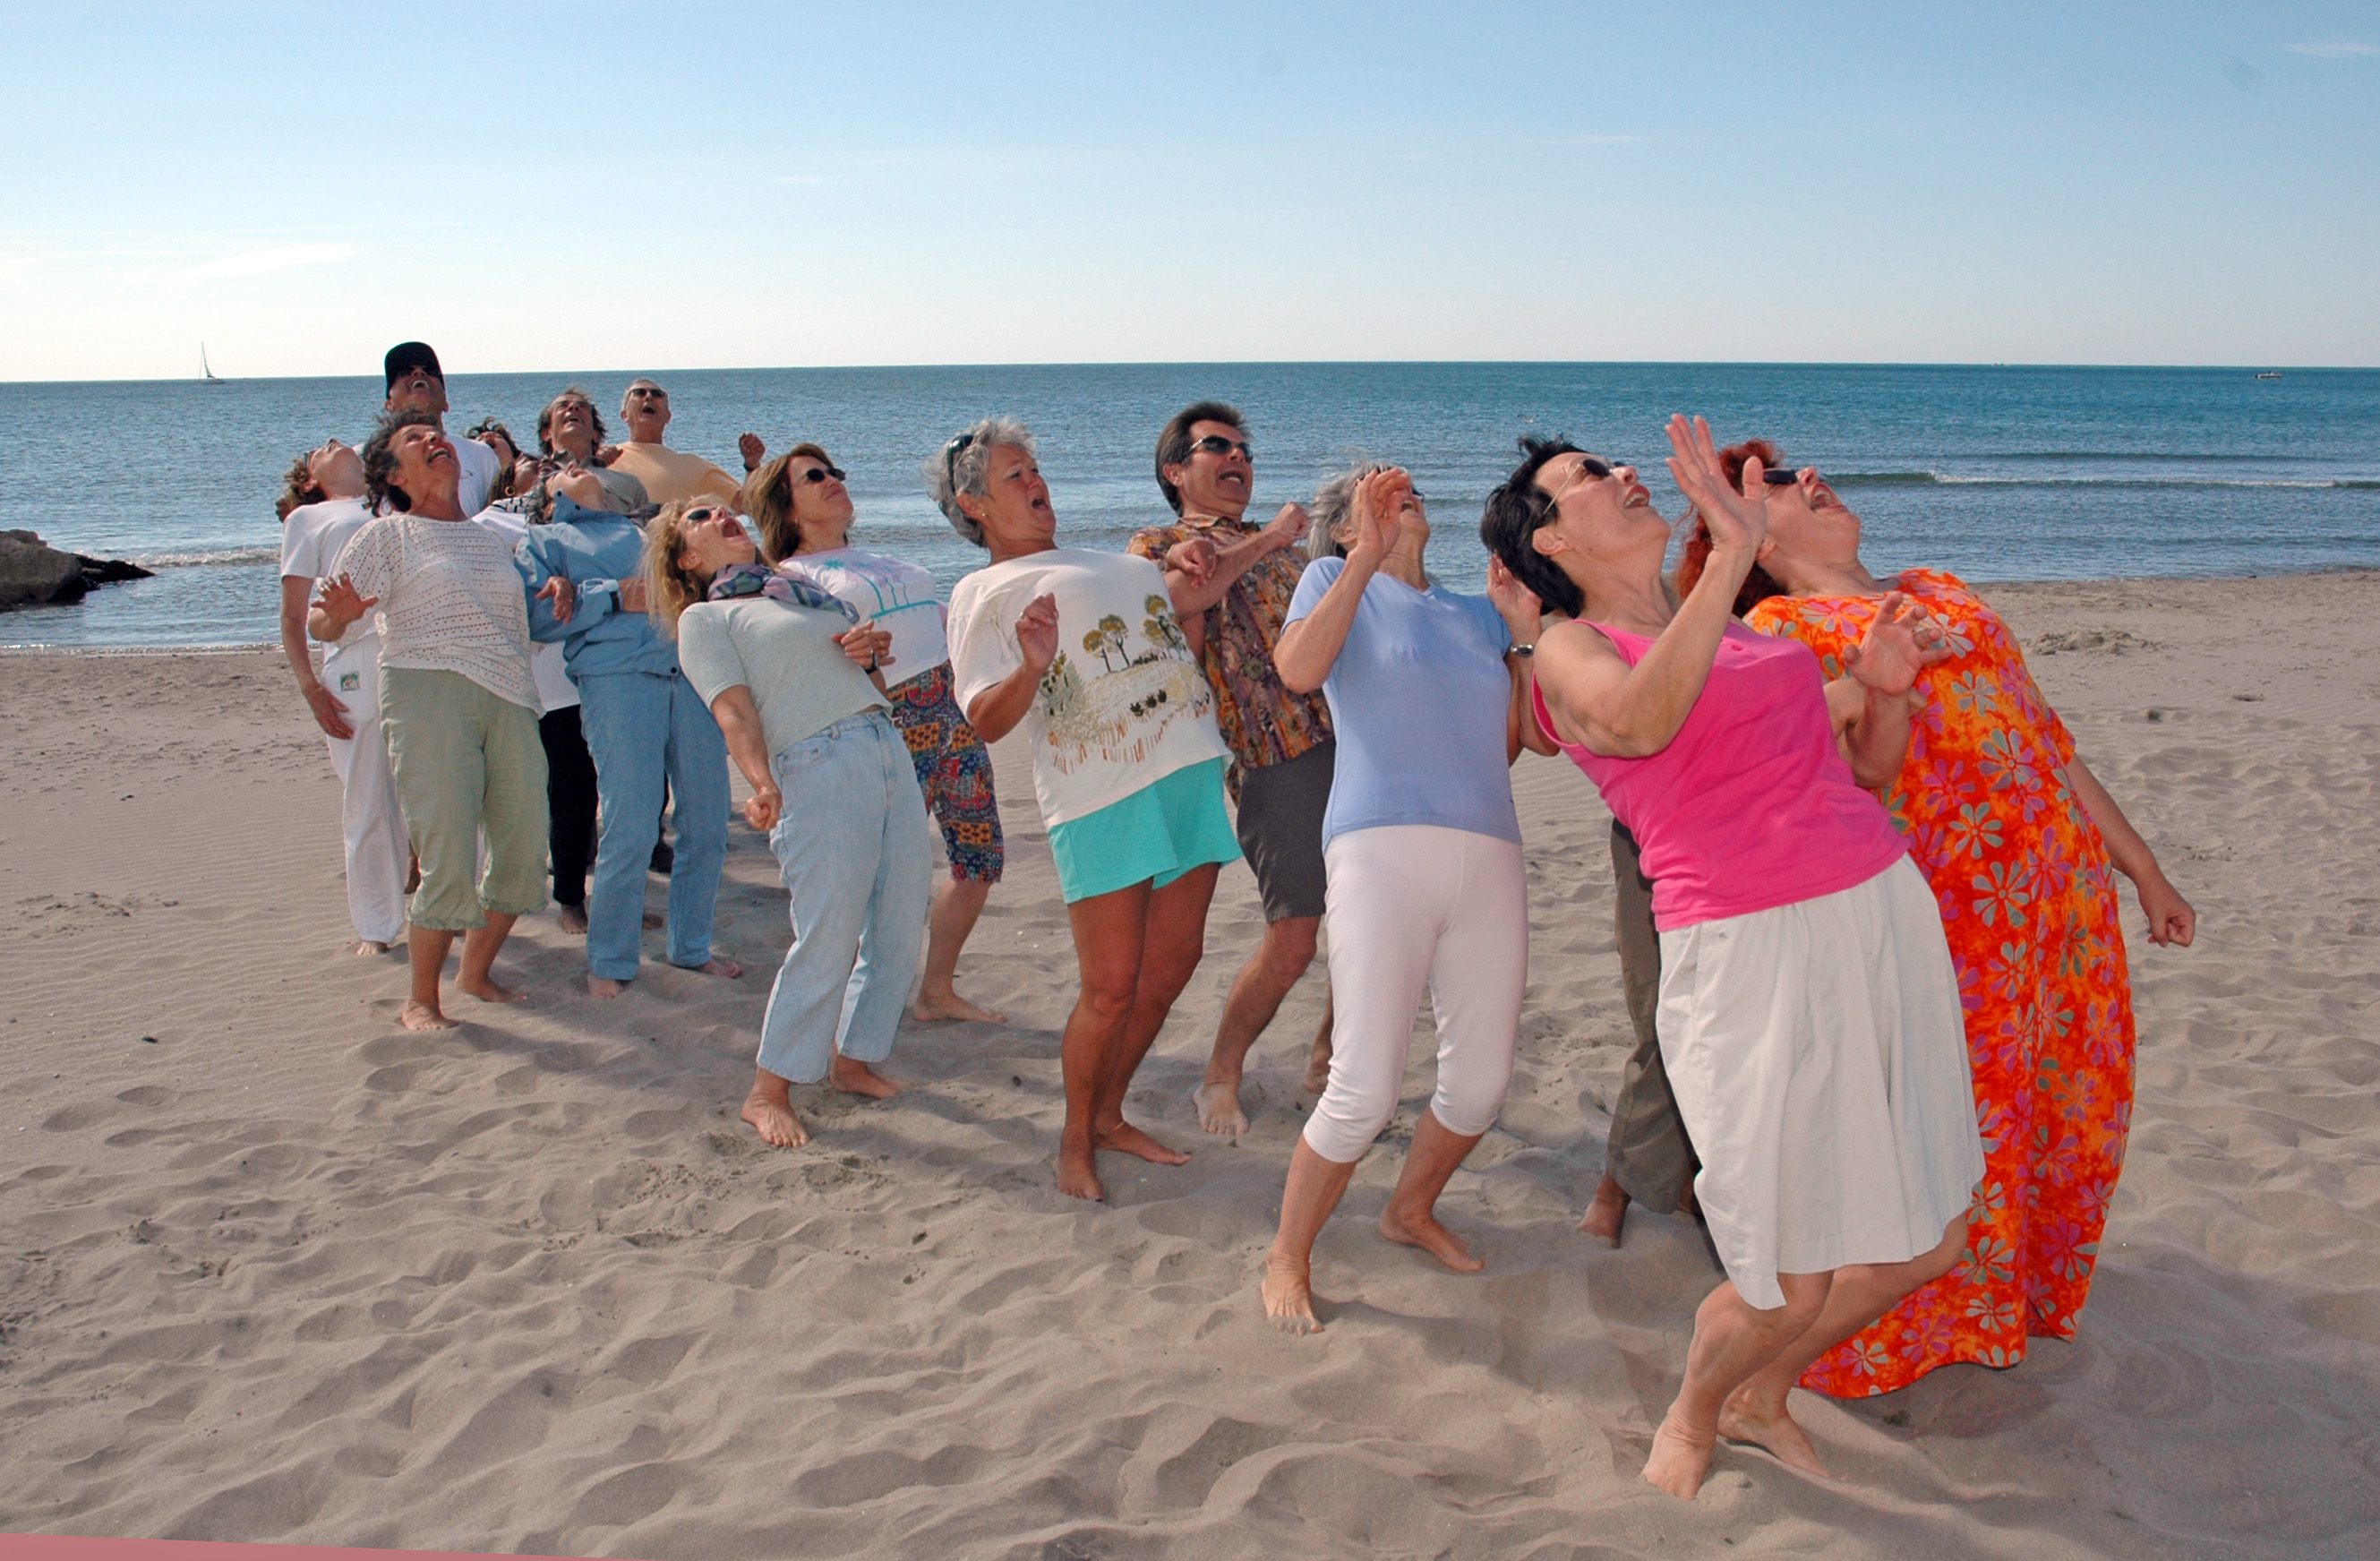 Séance de club de yoga du rire à Frontignan